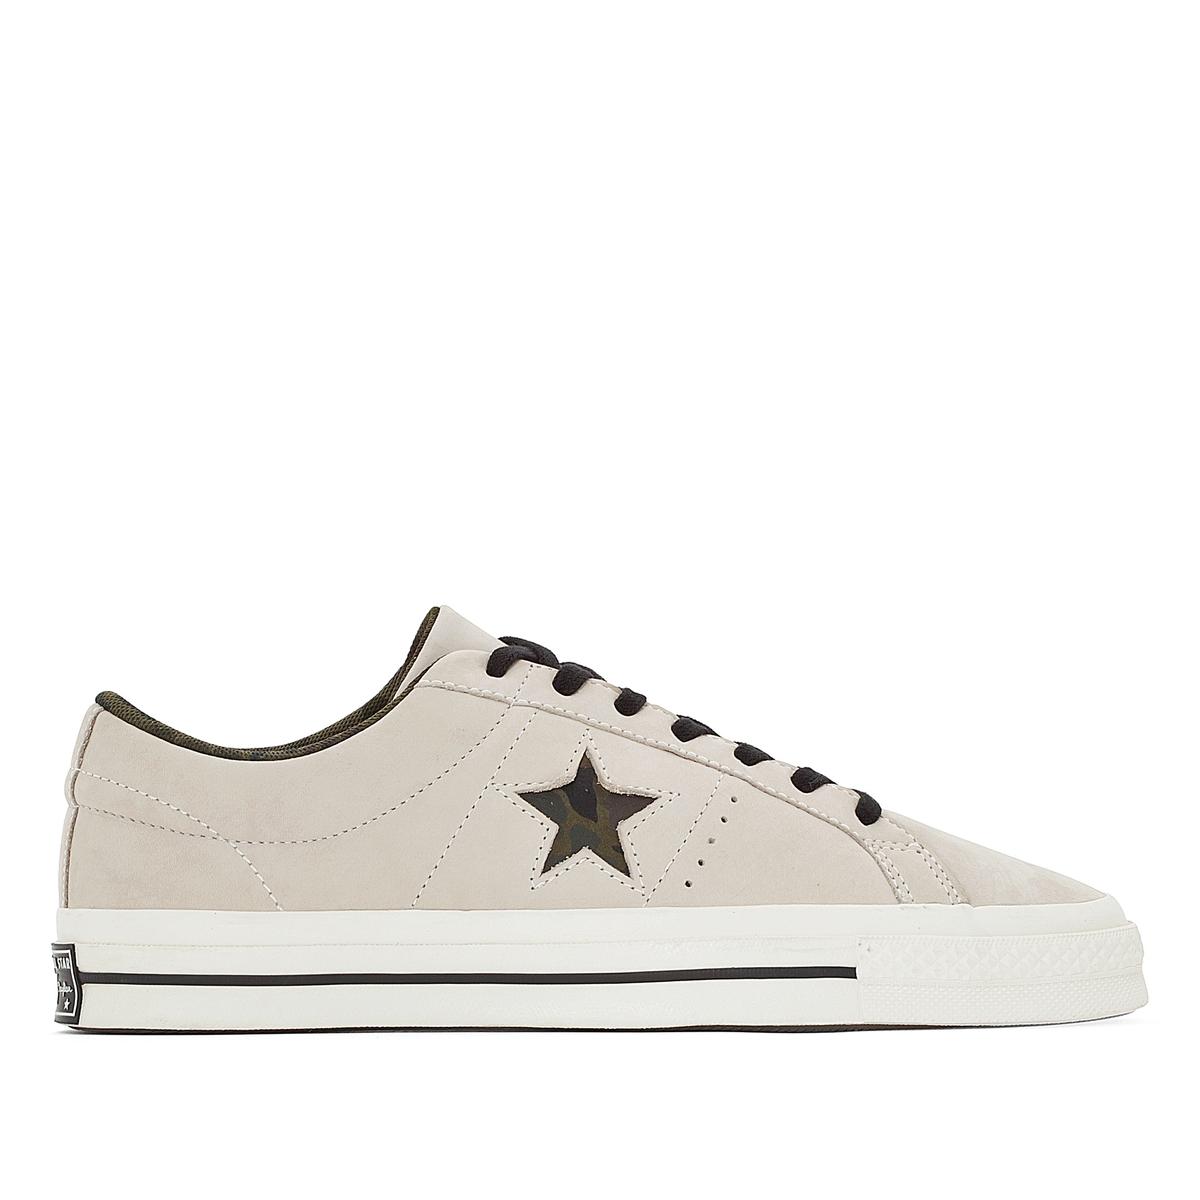 Zapatillas ONE STAR UTILITY CAMO PACK